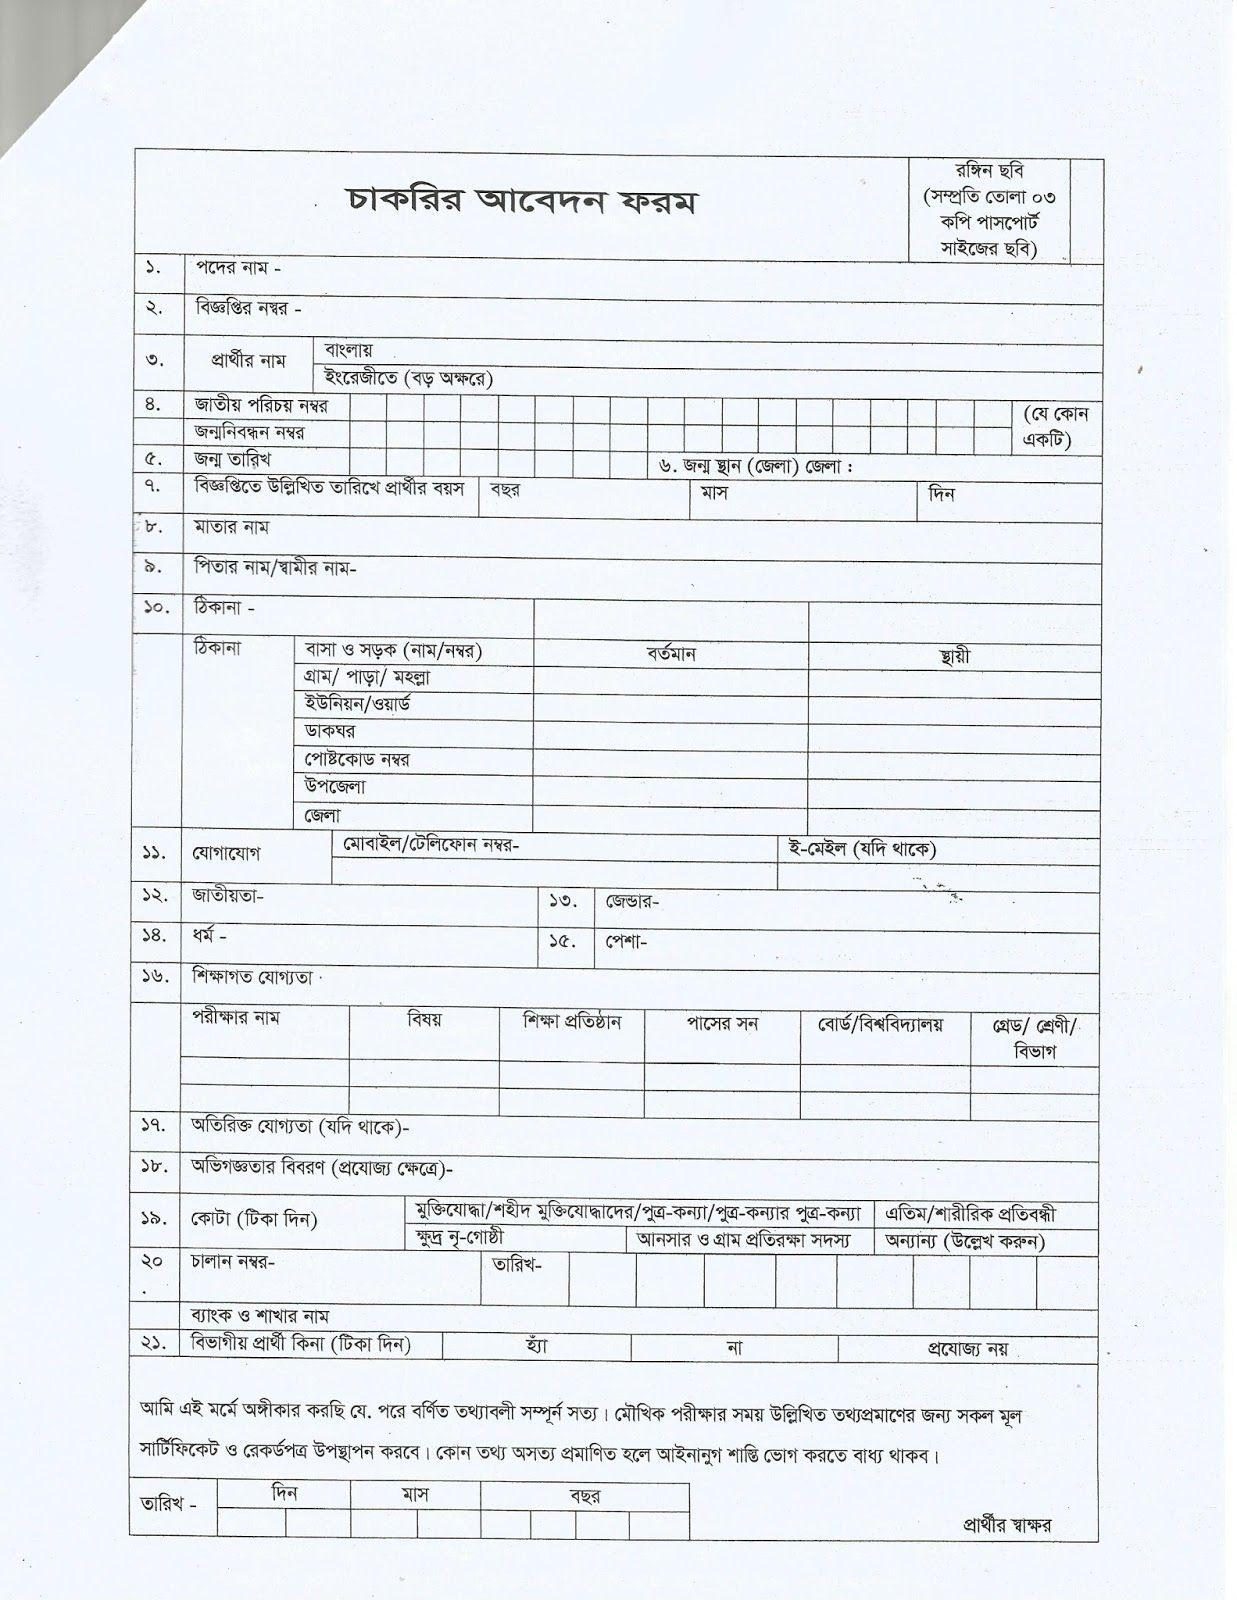 UNO office job circular with application form (NEW) Job